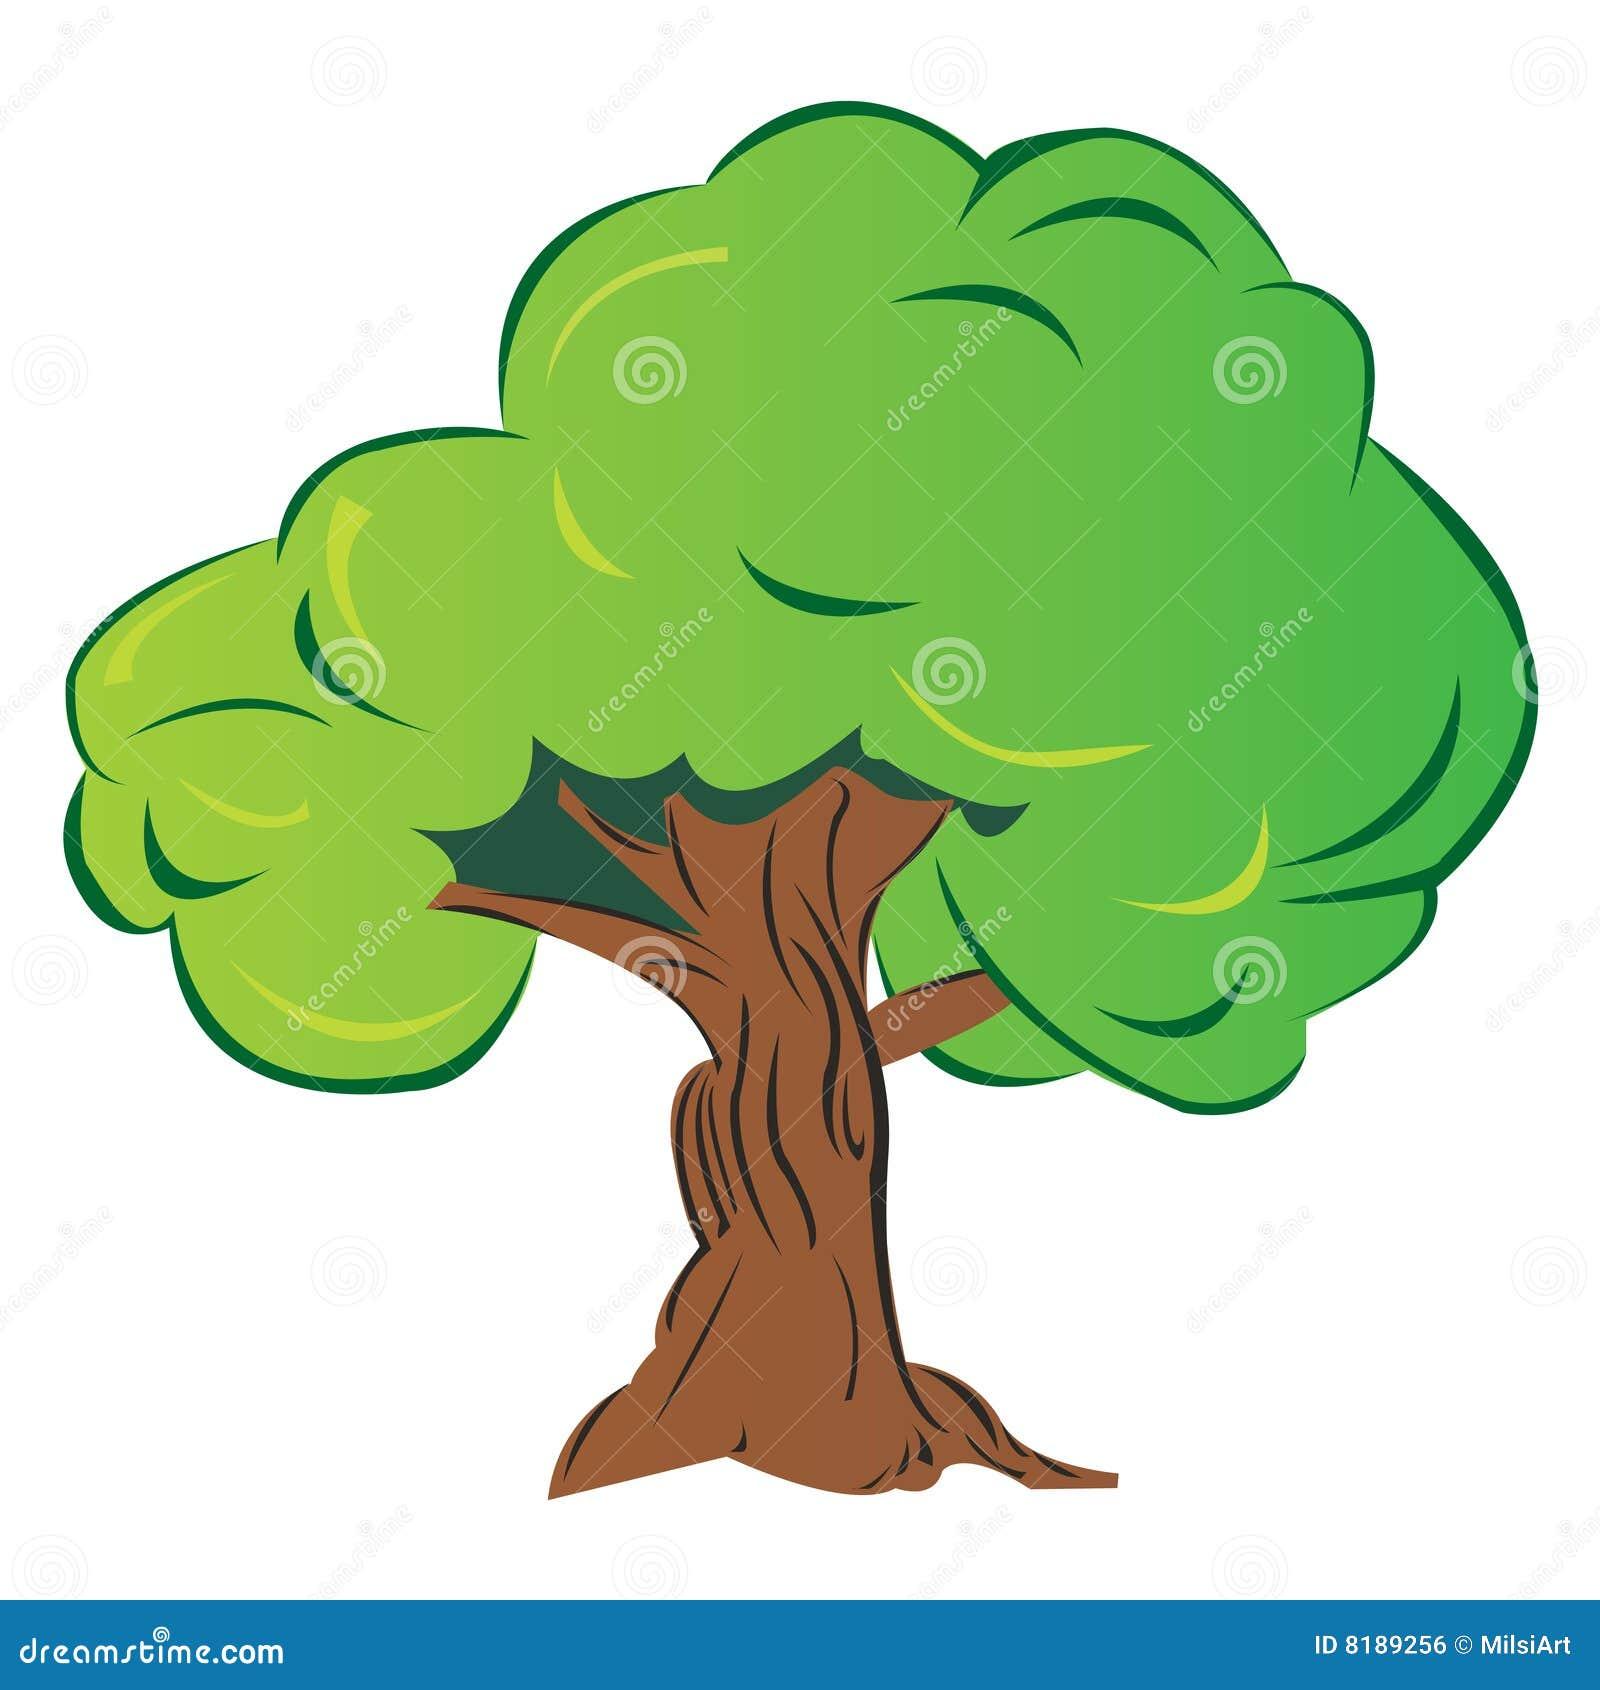 arbre de dessin anim image libre de droits image 8189256. Black Bedroom Furniture Sets. Home Design Ideas